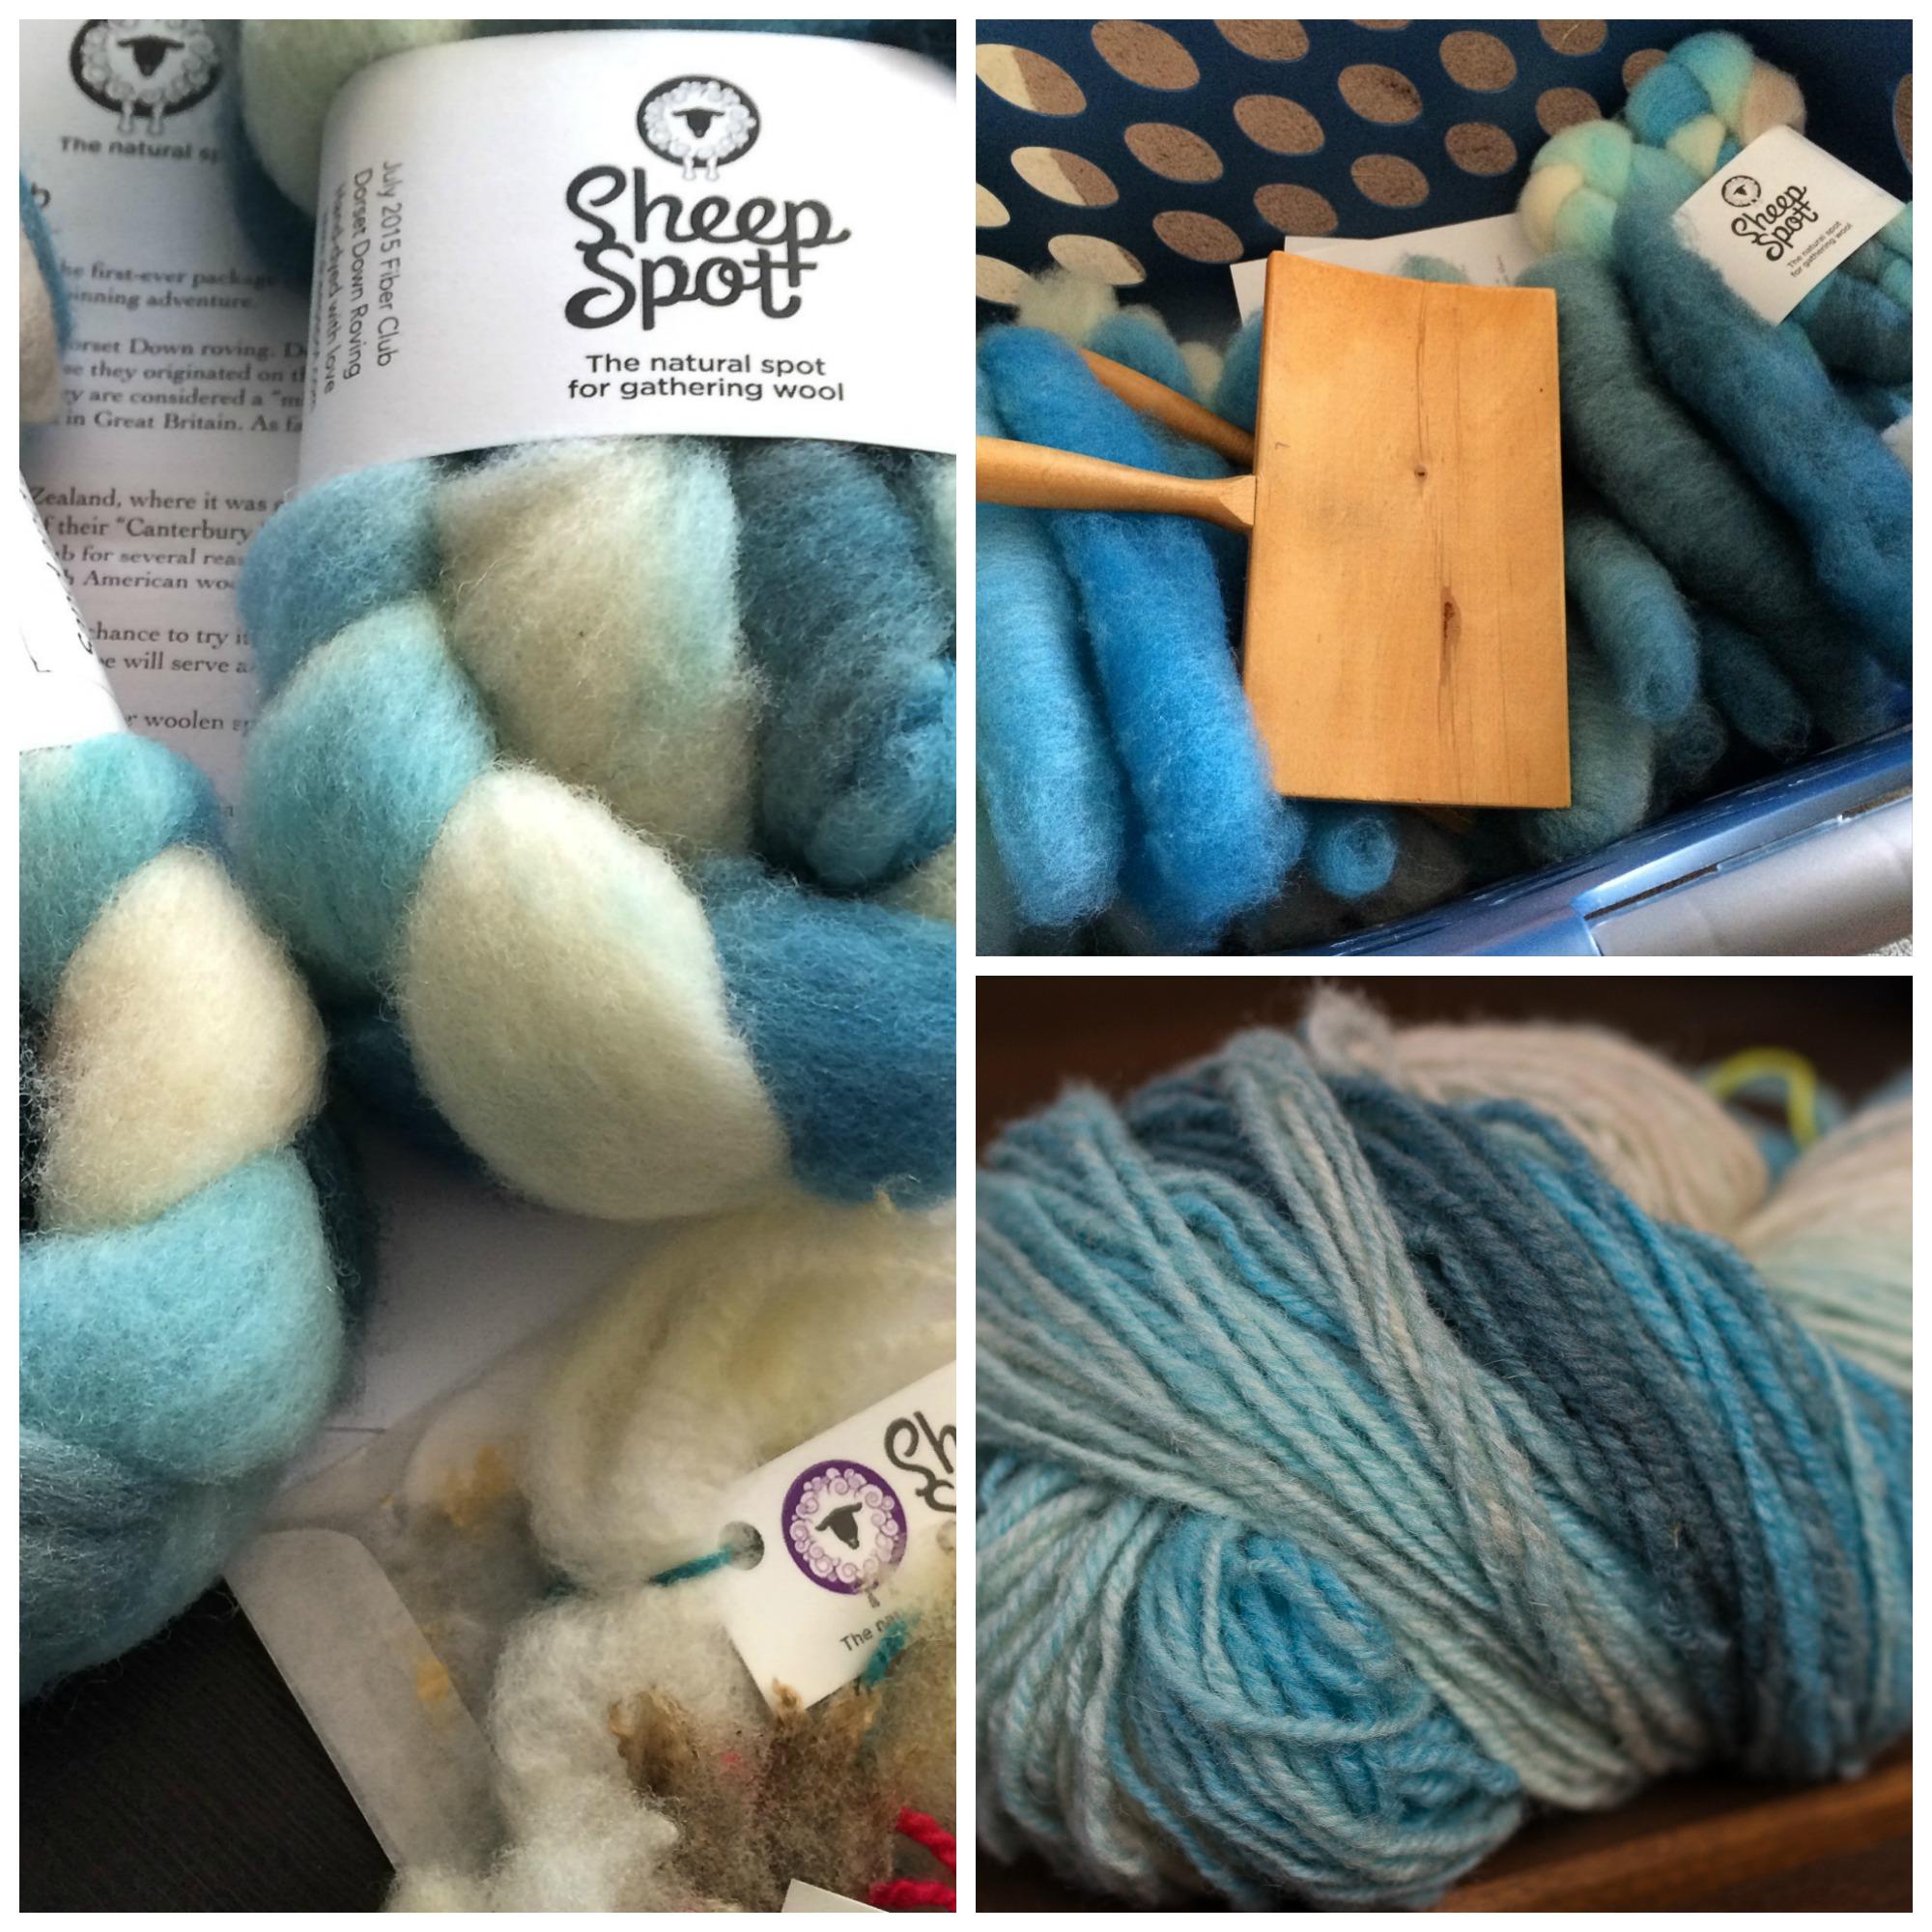 First Installment: Dorset Down Roving, carded and woolen spun